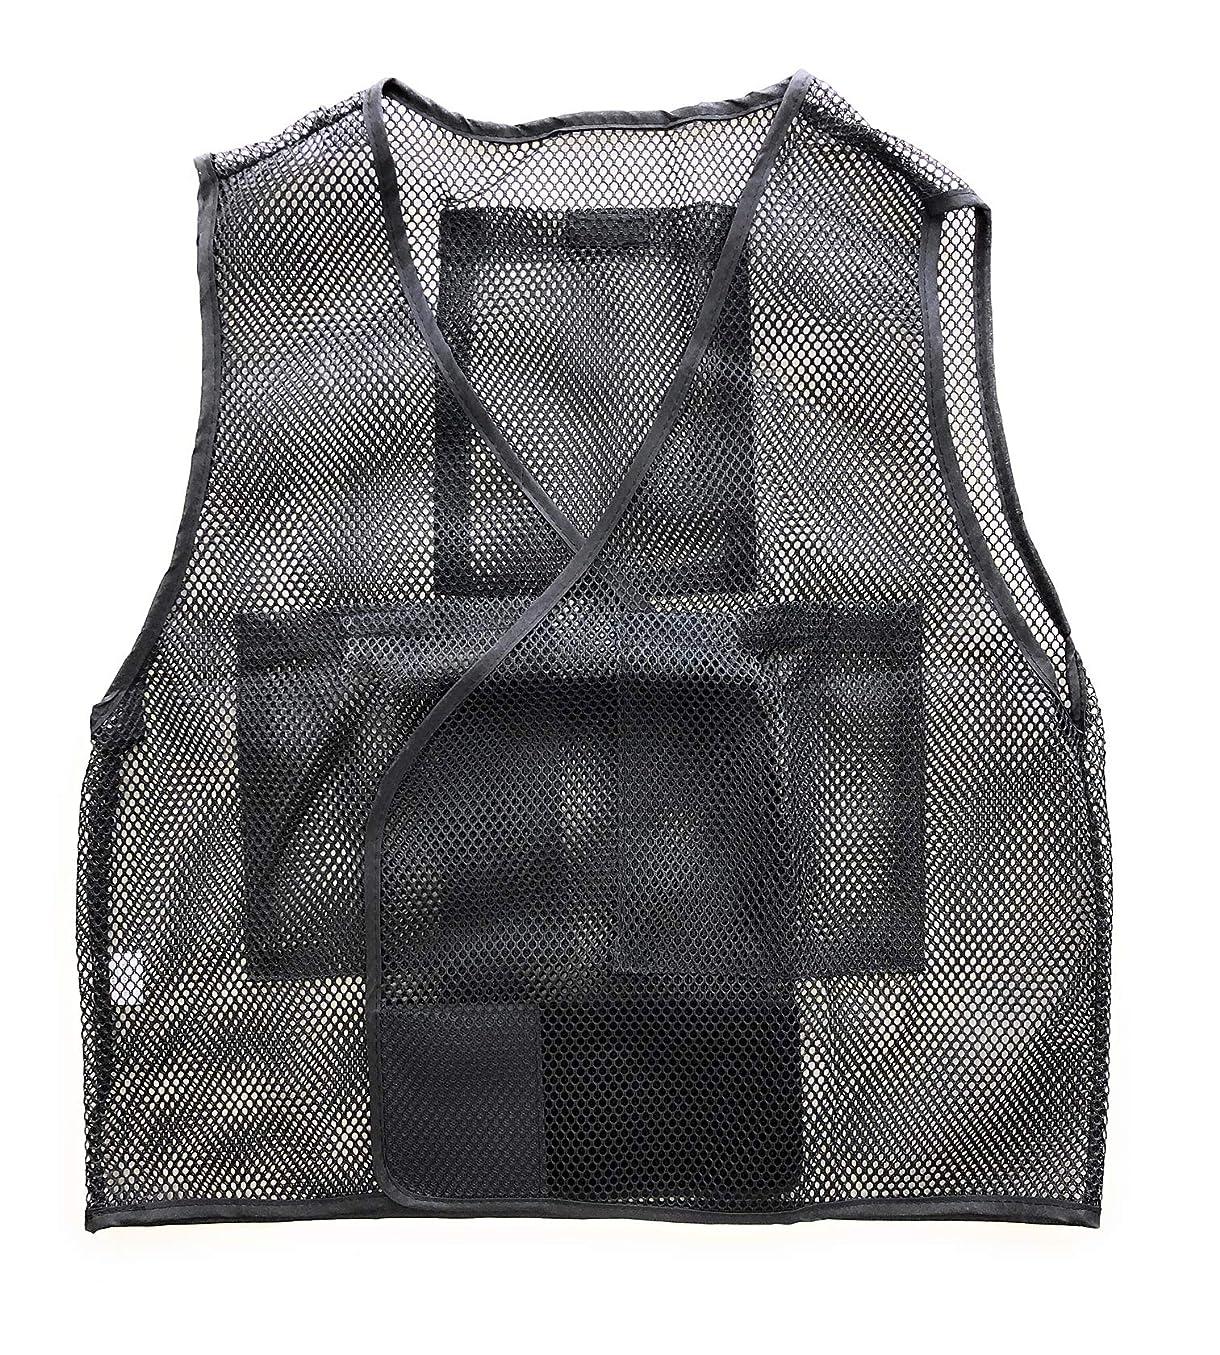 PAX-ASIAN ひんやりMAX 男女兼用 熱中対策 涼感 メッシュベスト 保冷剤収納ポケット 前後4個収納可能 (冷却剤は別売りです)ブラック #935(1)